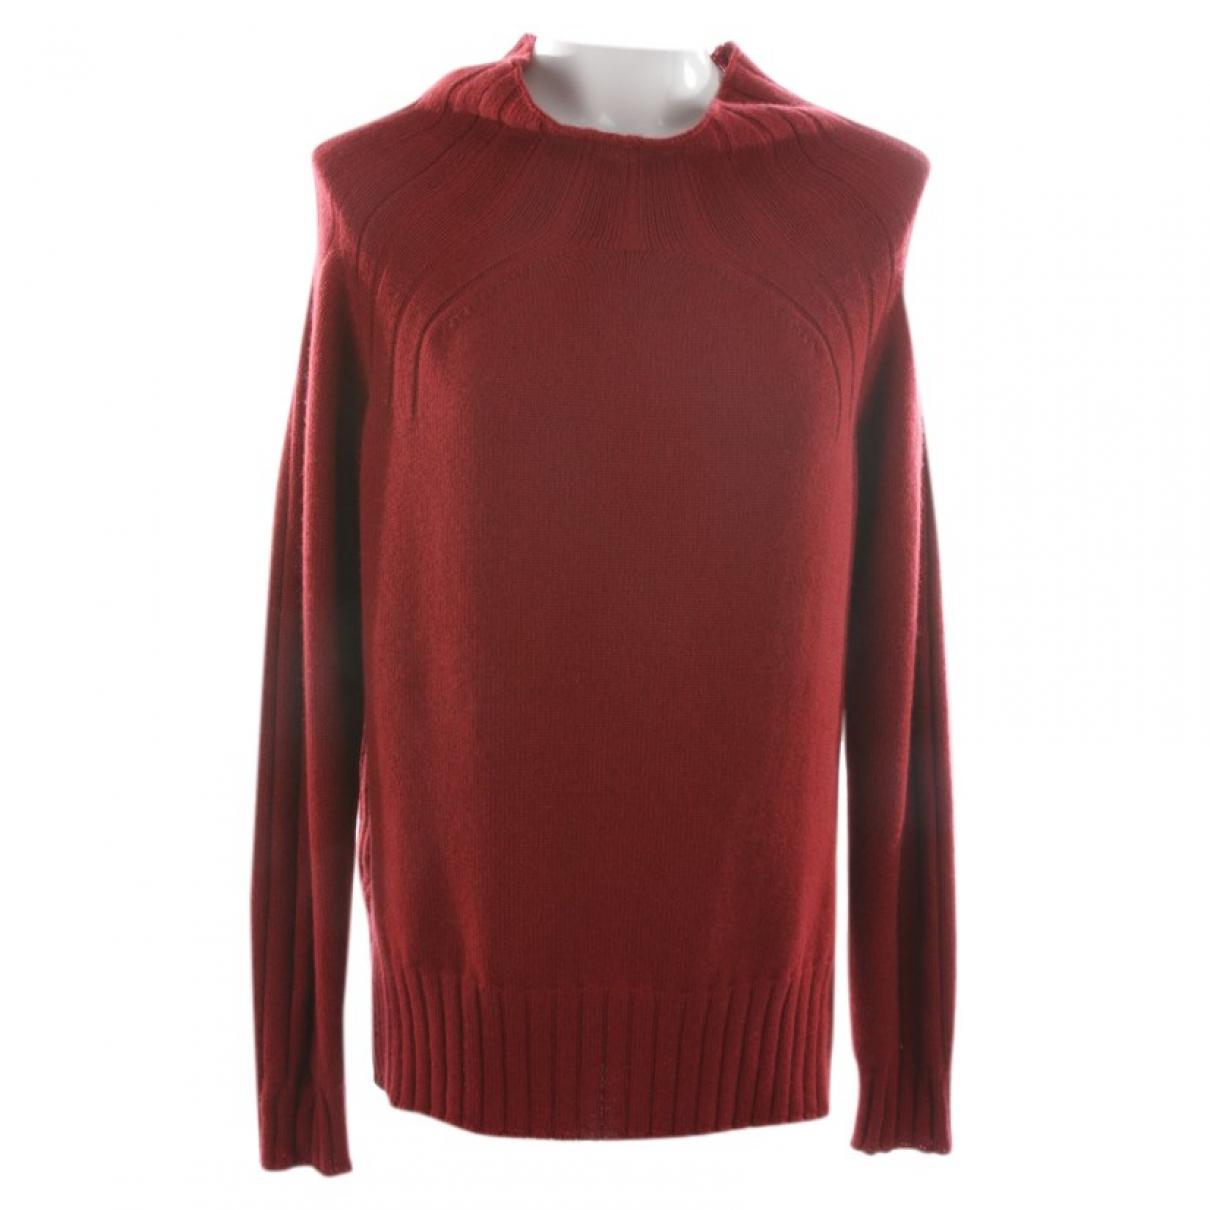 Autre Marque \N Brown Cashmere Knitwear for Women 36 FR